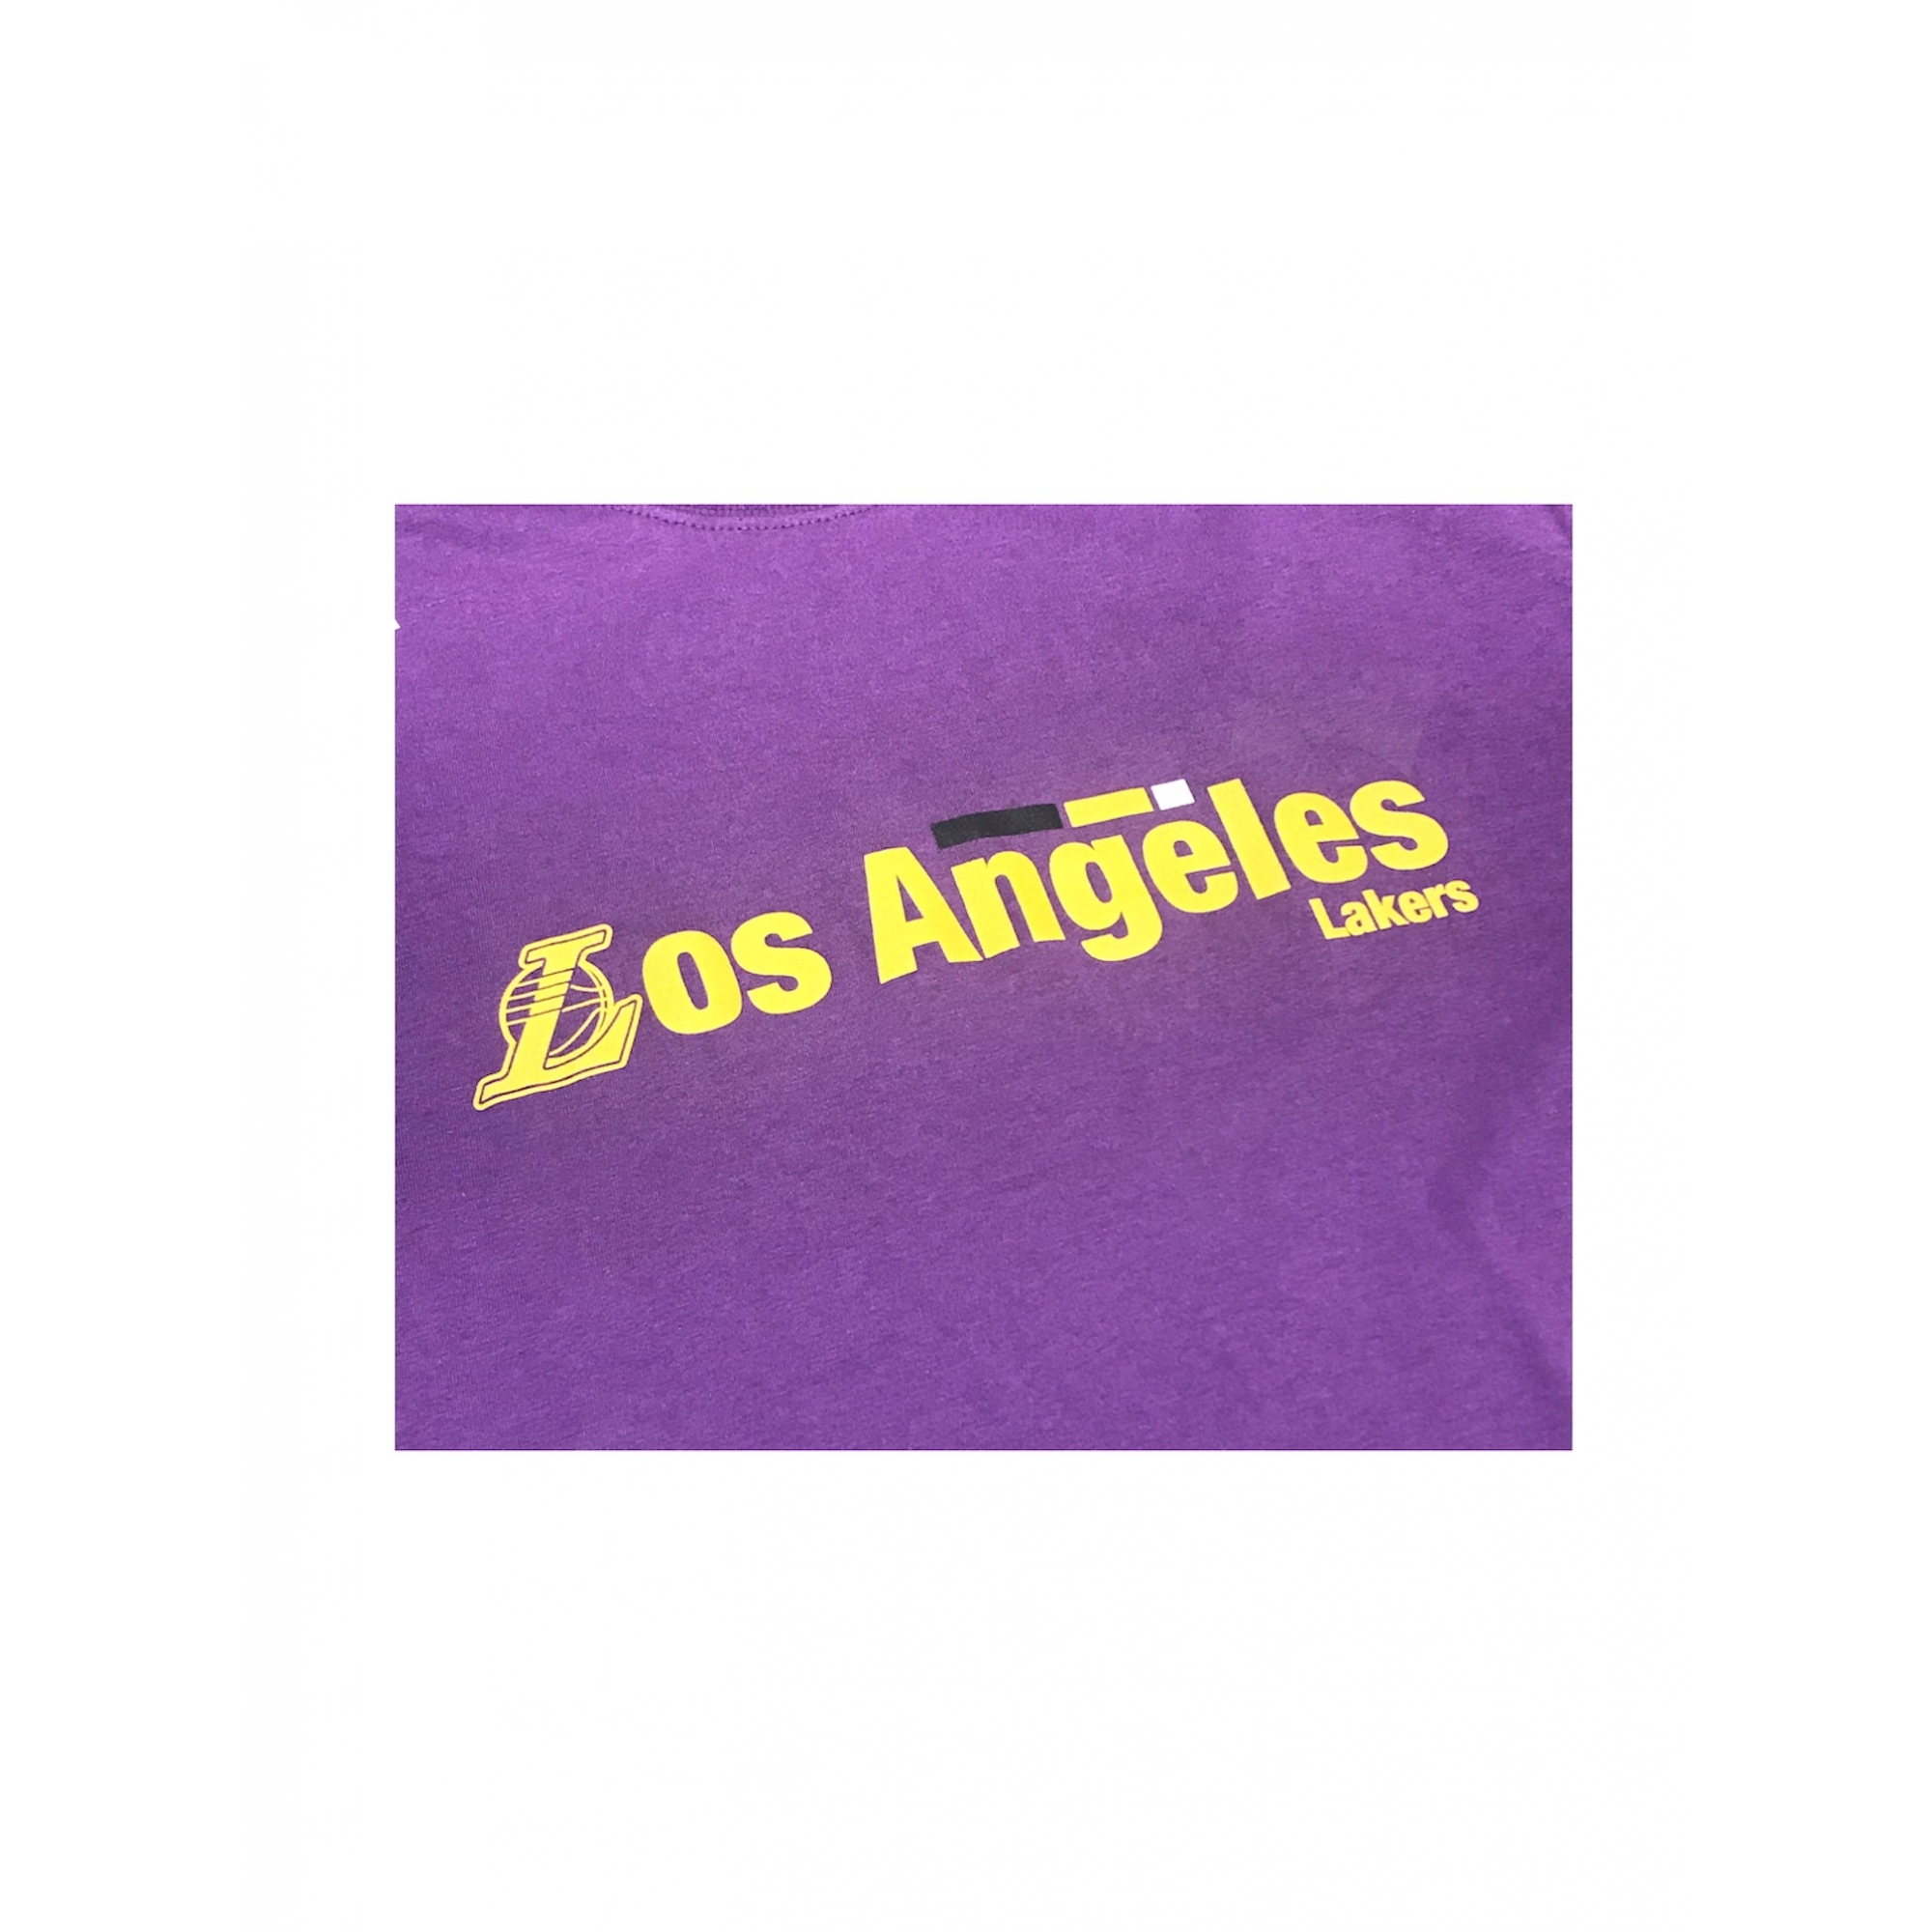 CAMISETA NEW ERA MASCULINA LOS ANGELES LAKERS ROXO